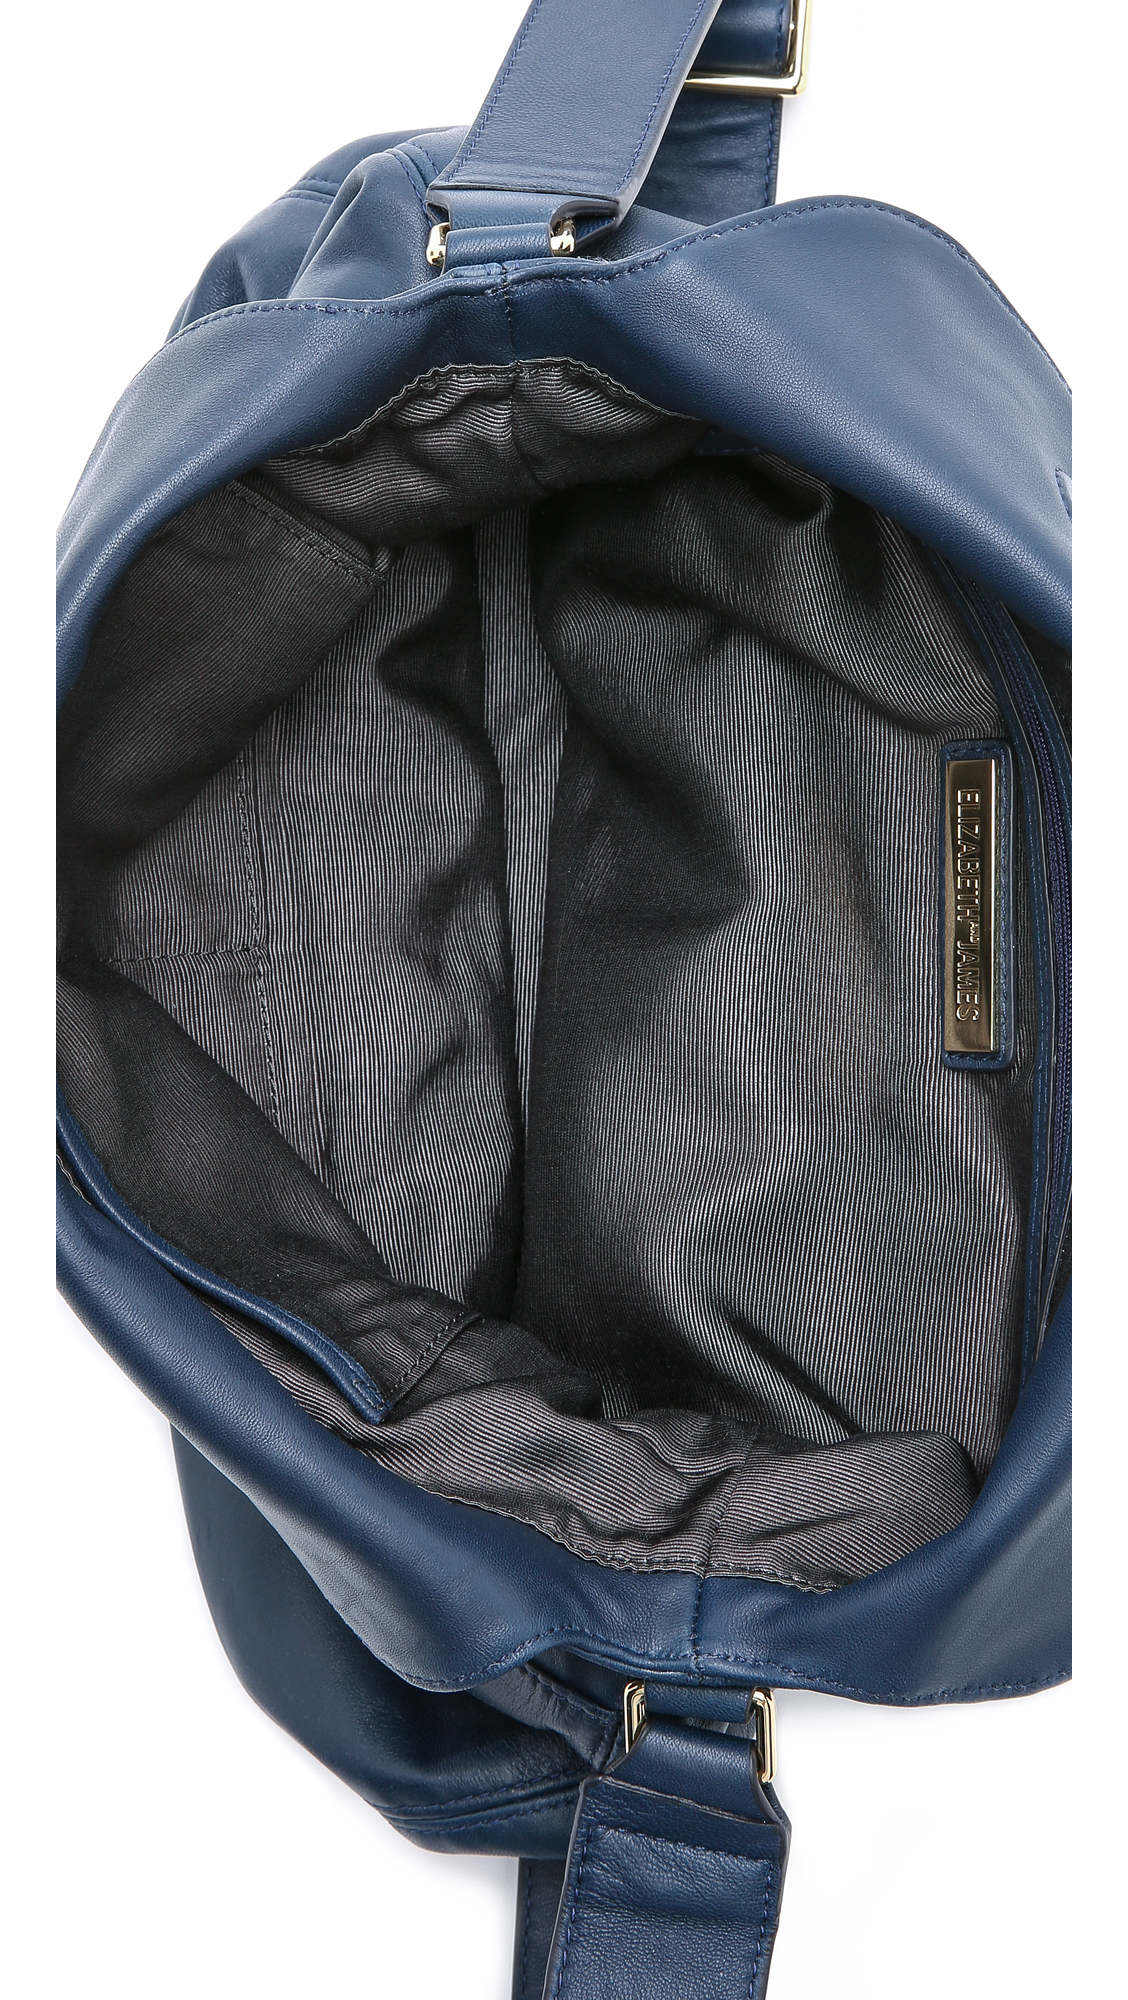 Elizabeth and James James Cross Body Hobo Bag - Navy in Blue